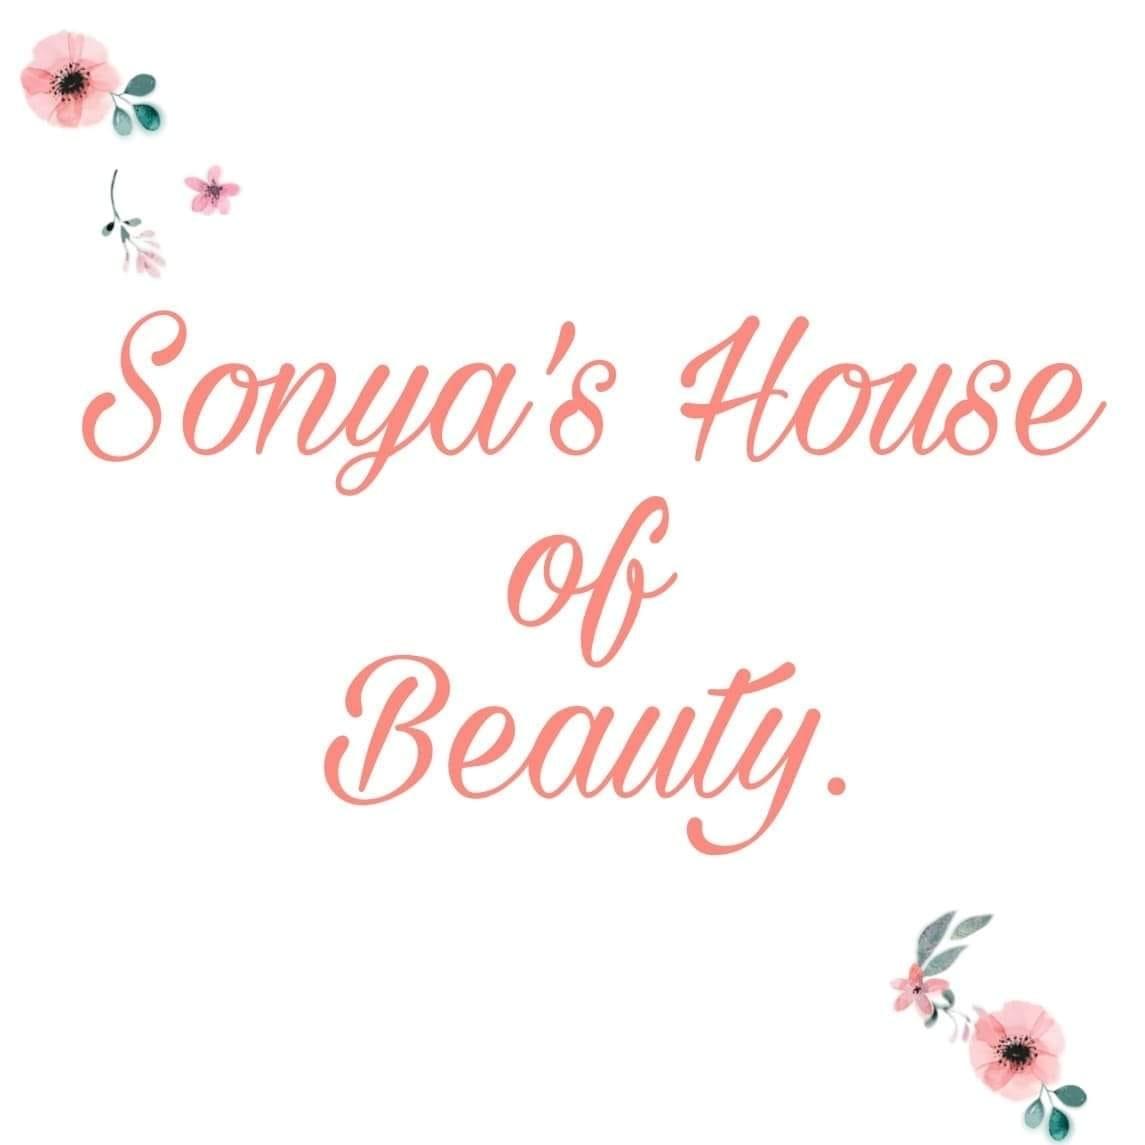 Sonya's House of Beauty